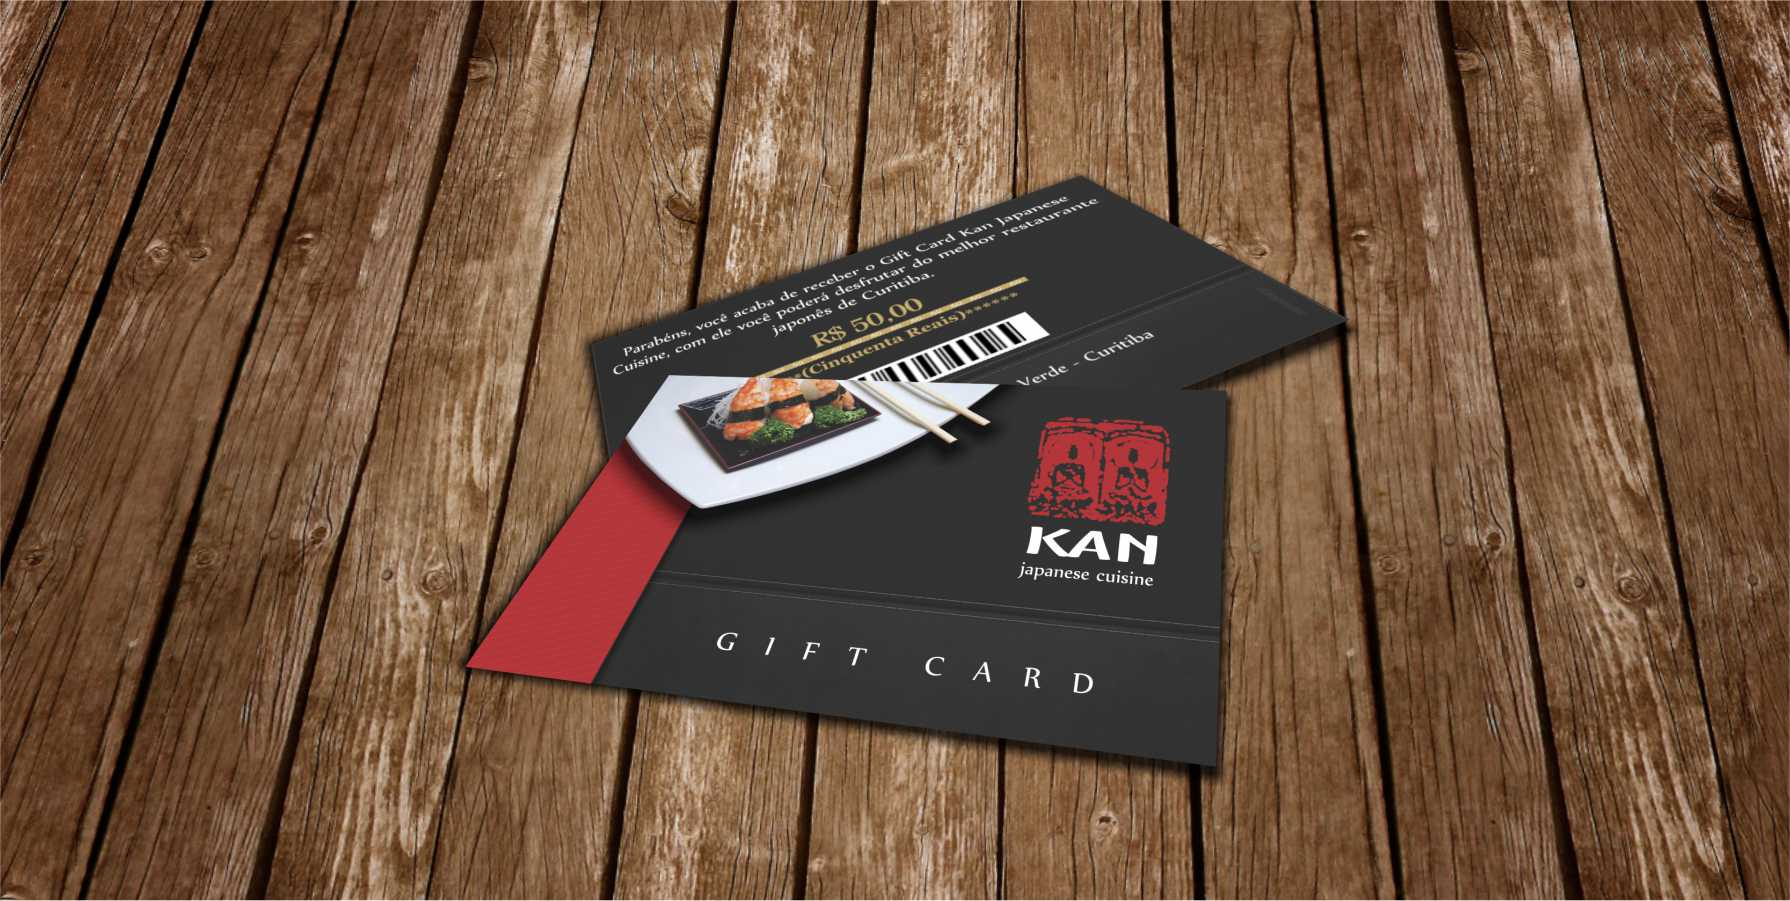 Gift Card KAN